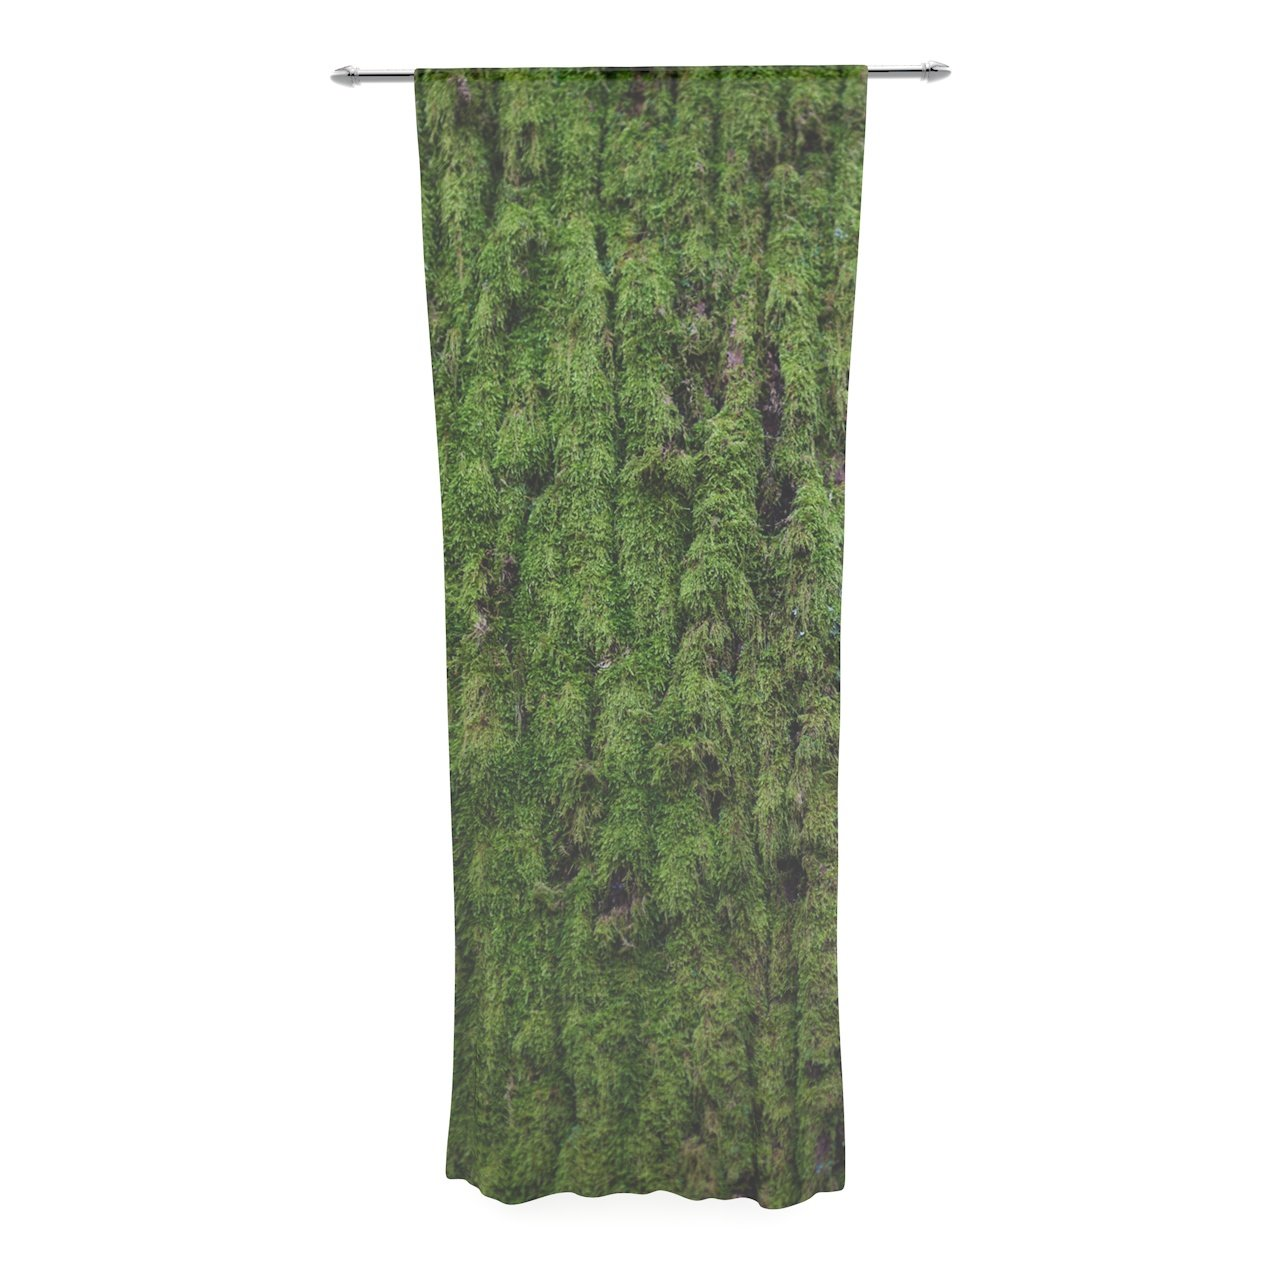 Kess InHouse Susan Sanders Emerald Moss Green Nature Decorative Set 30 x 84 Sheer Curtains